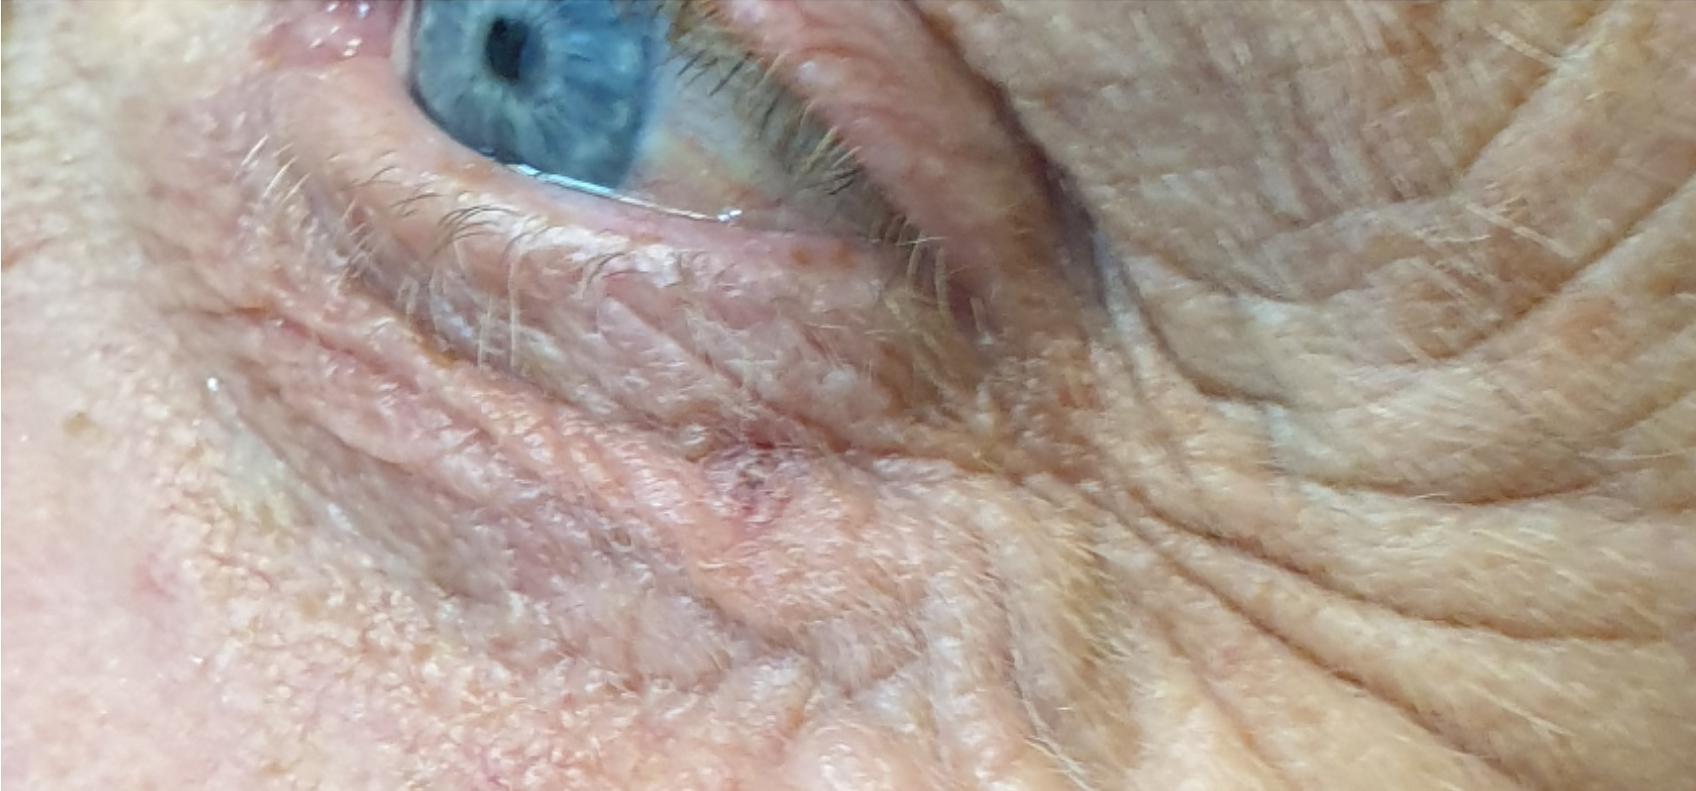 Skin tag removed